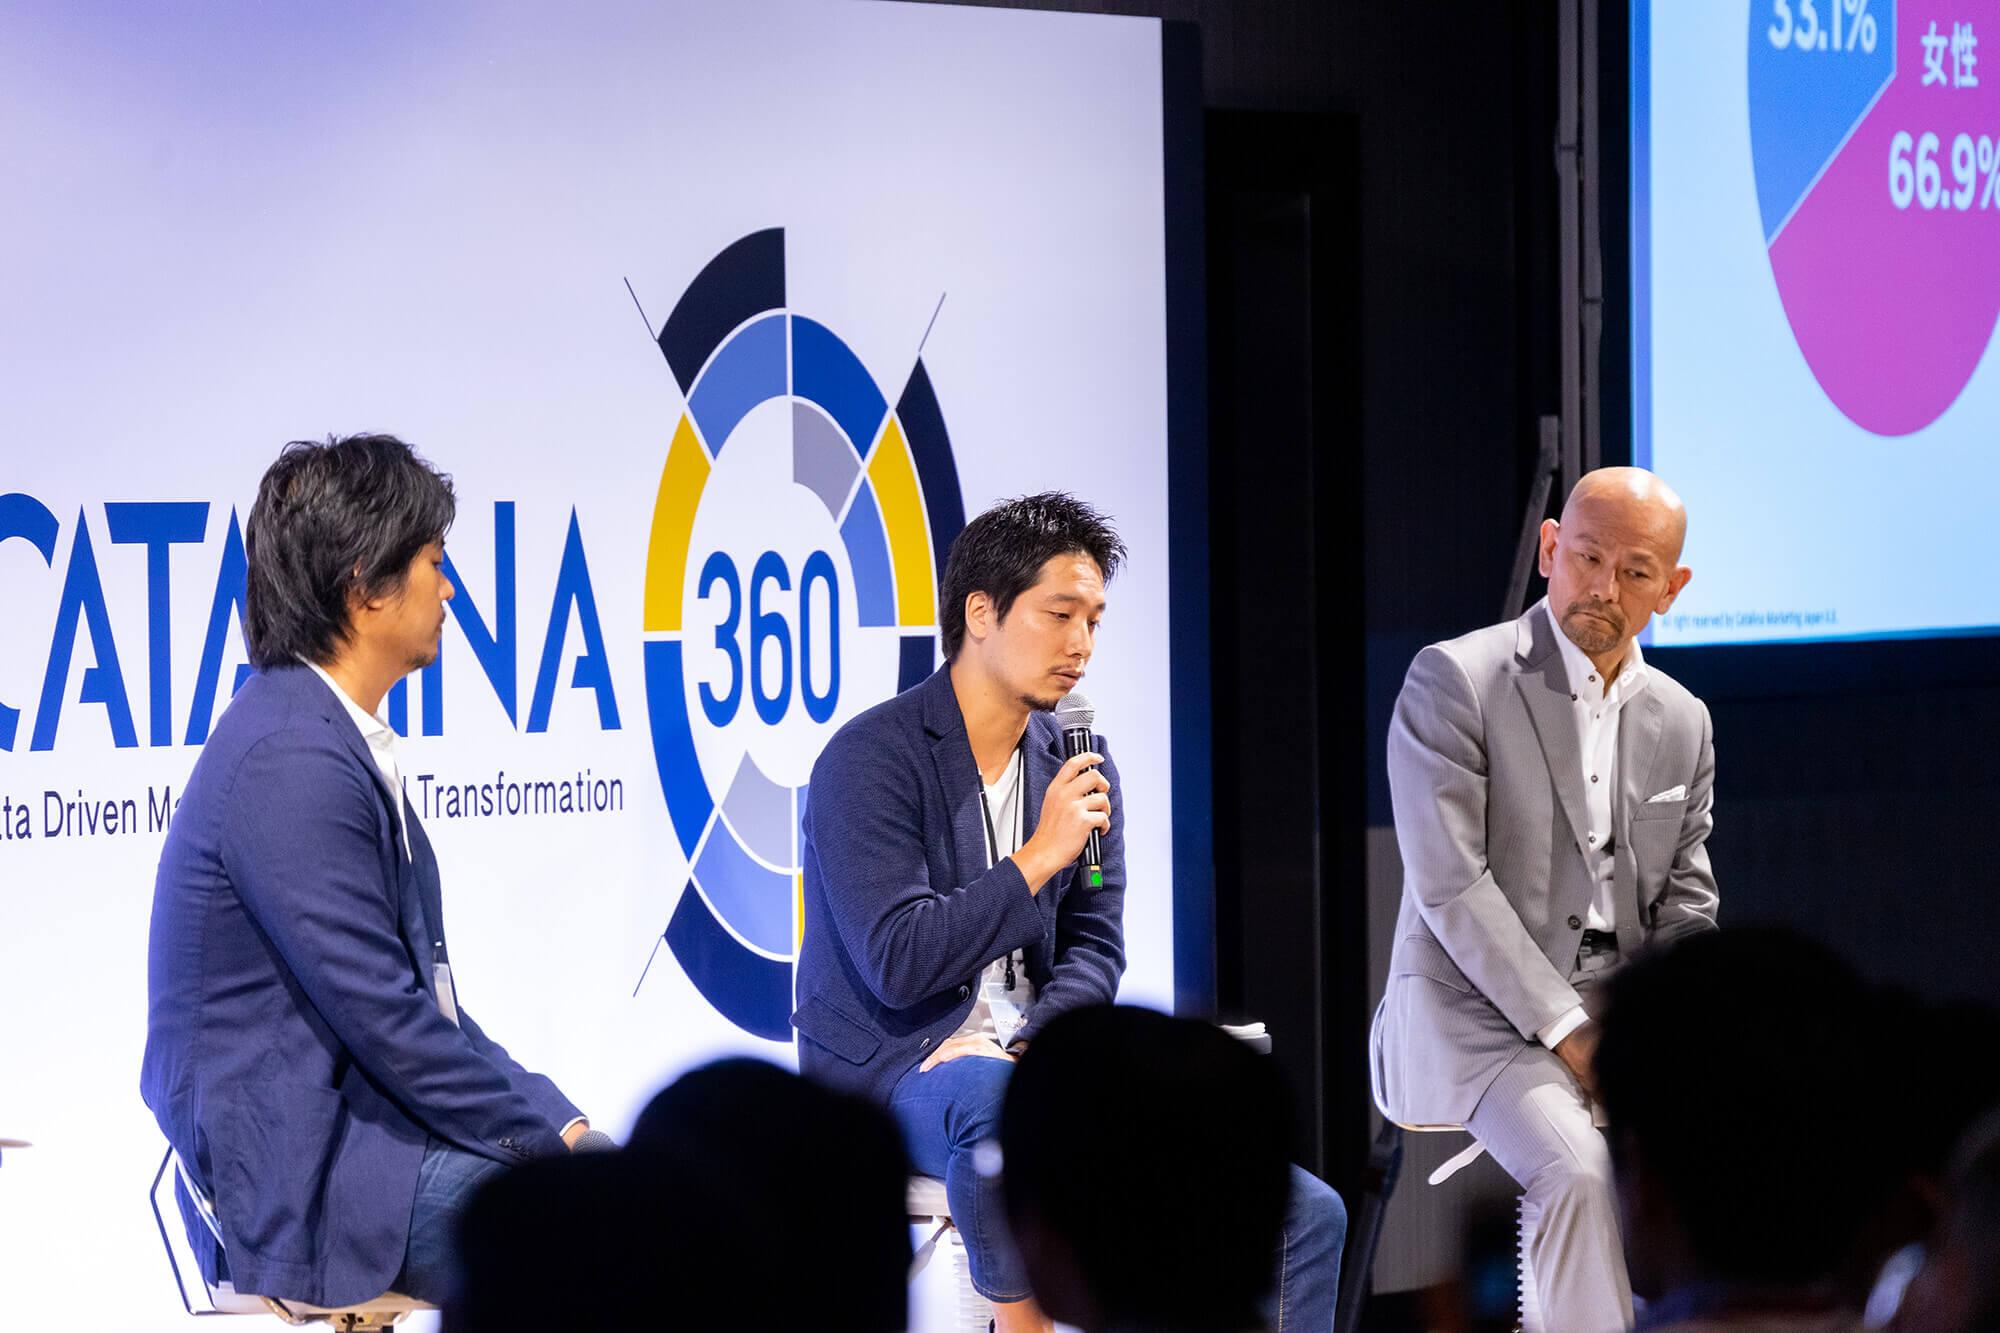 CATALINA360 – Data Drive Marketing & Digital Transformation